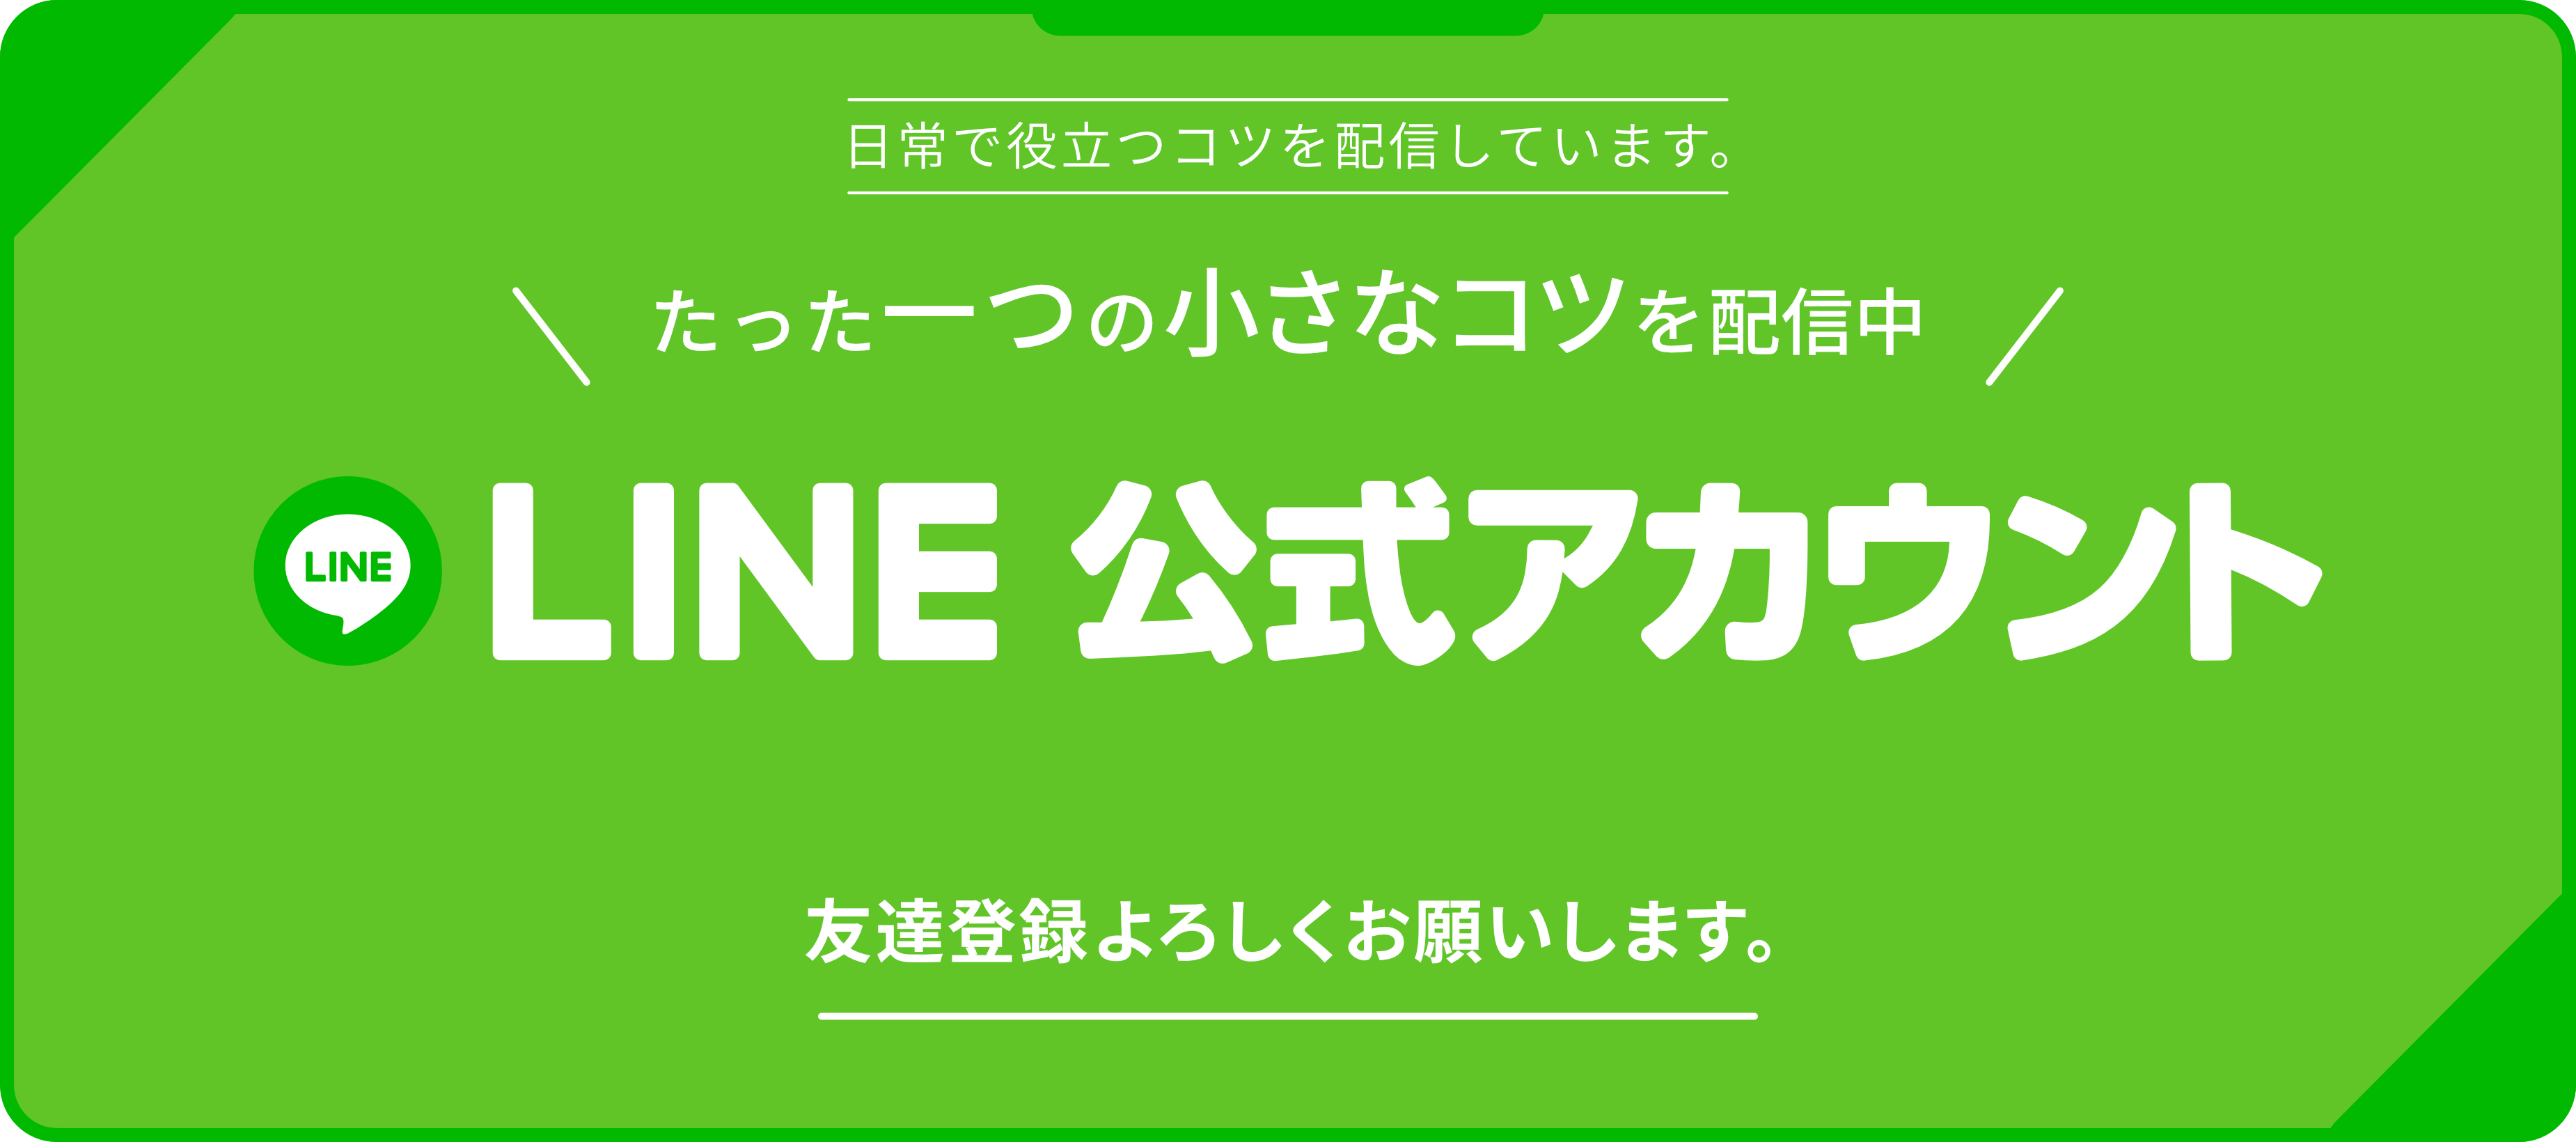 LINE@-SP